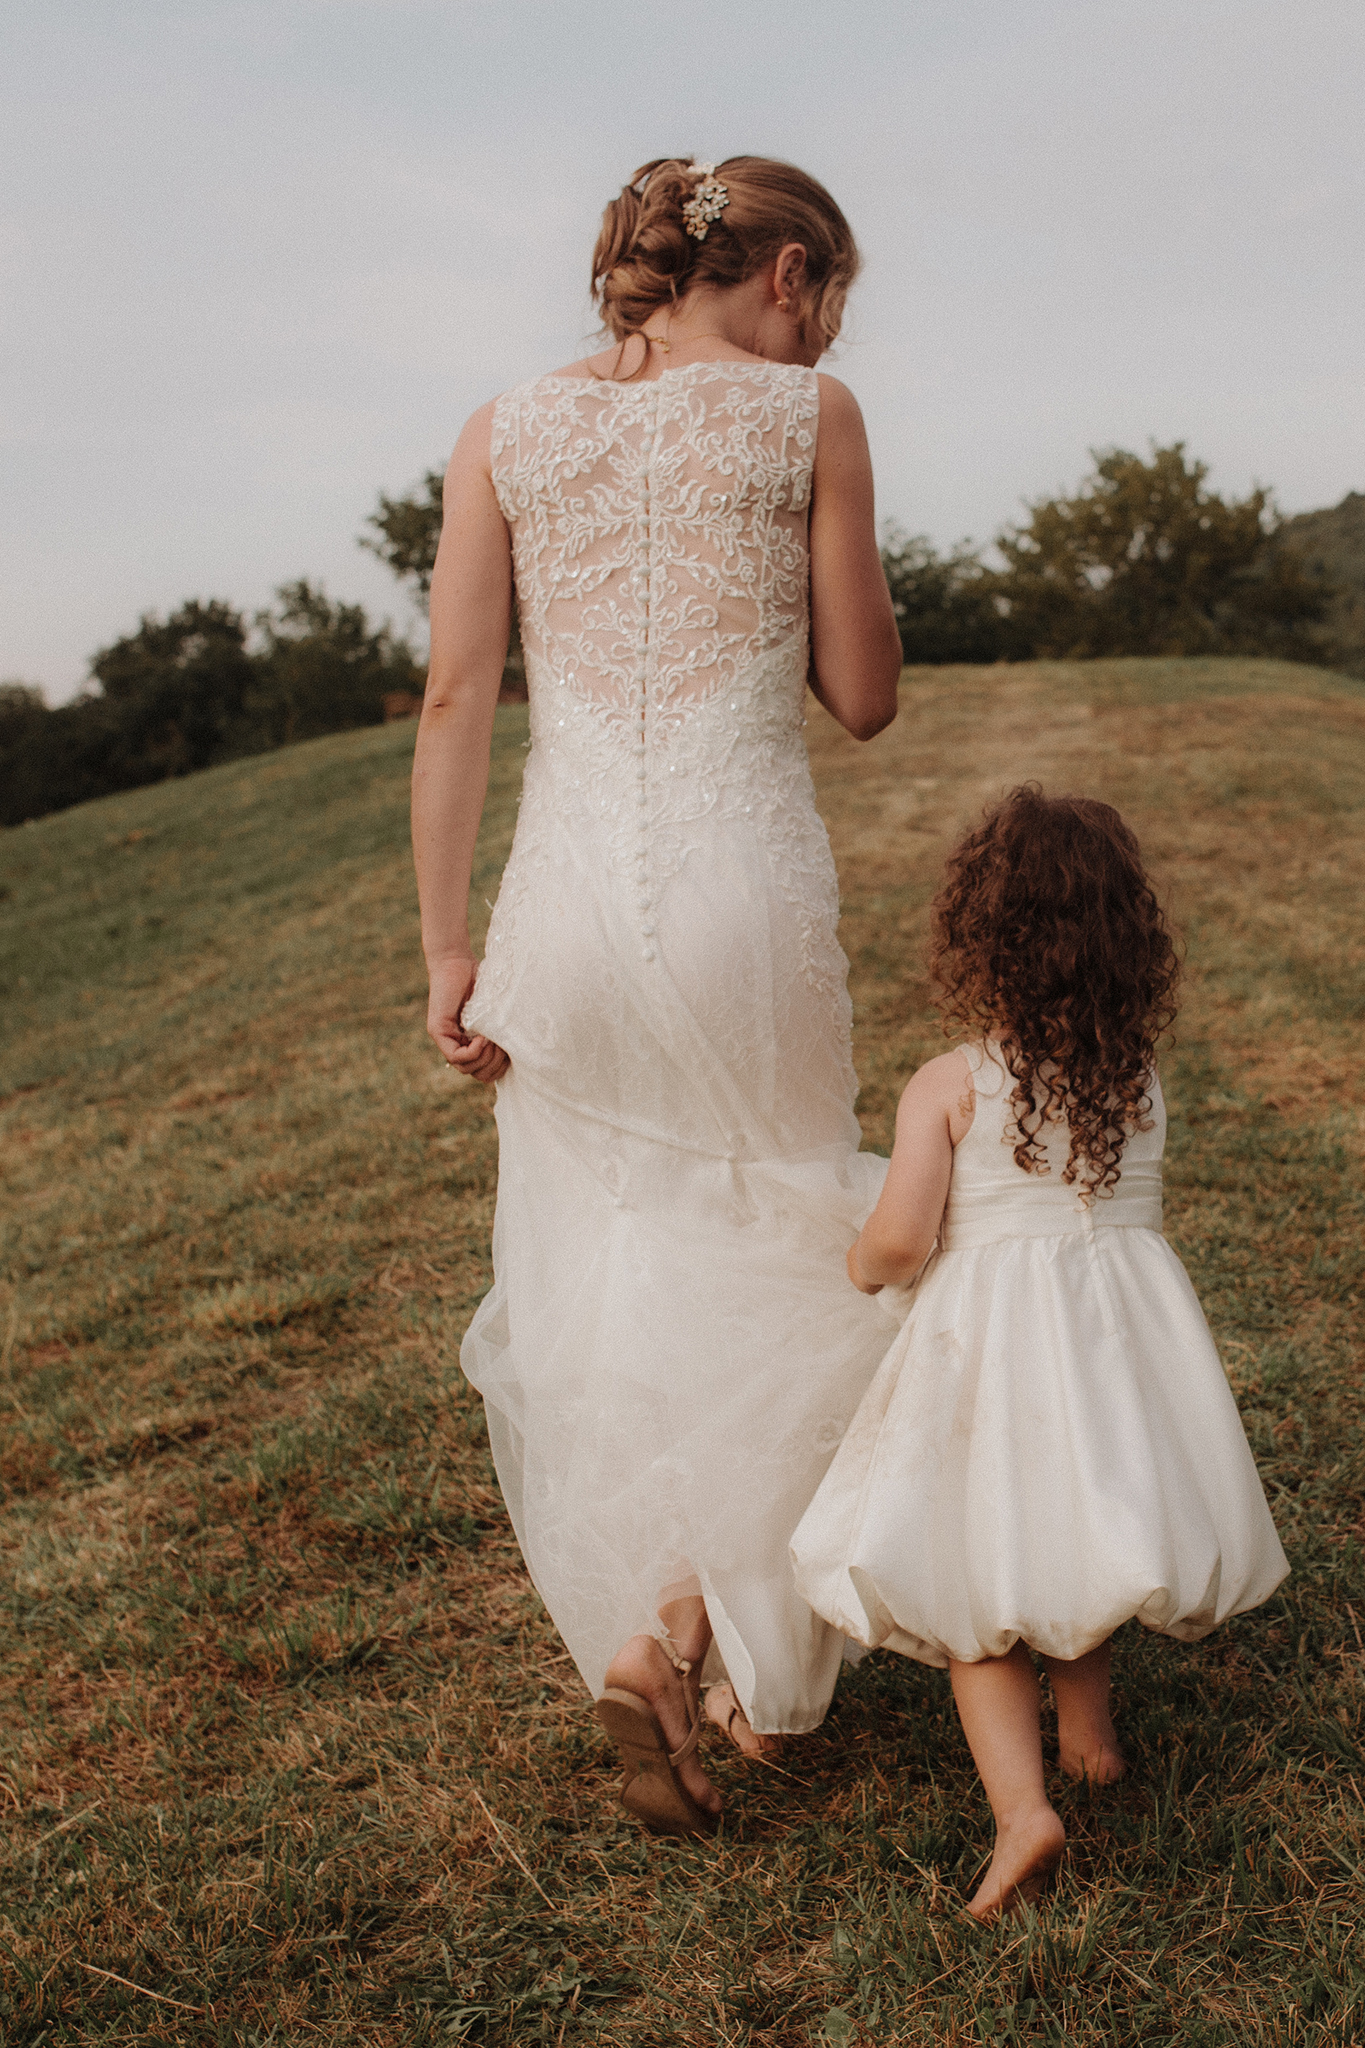 vermont-wedding-photographer-outdoor-farm-wedding-62.jpg